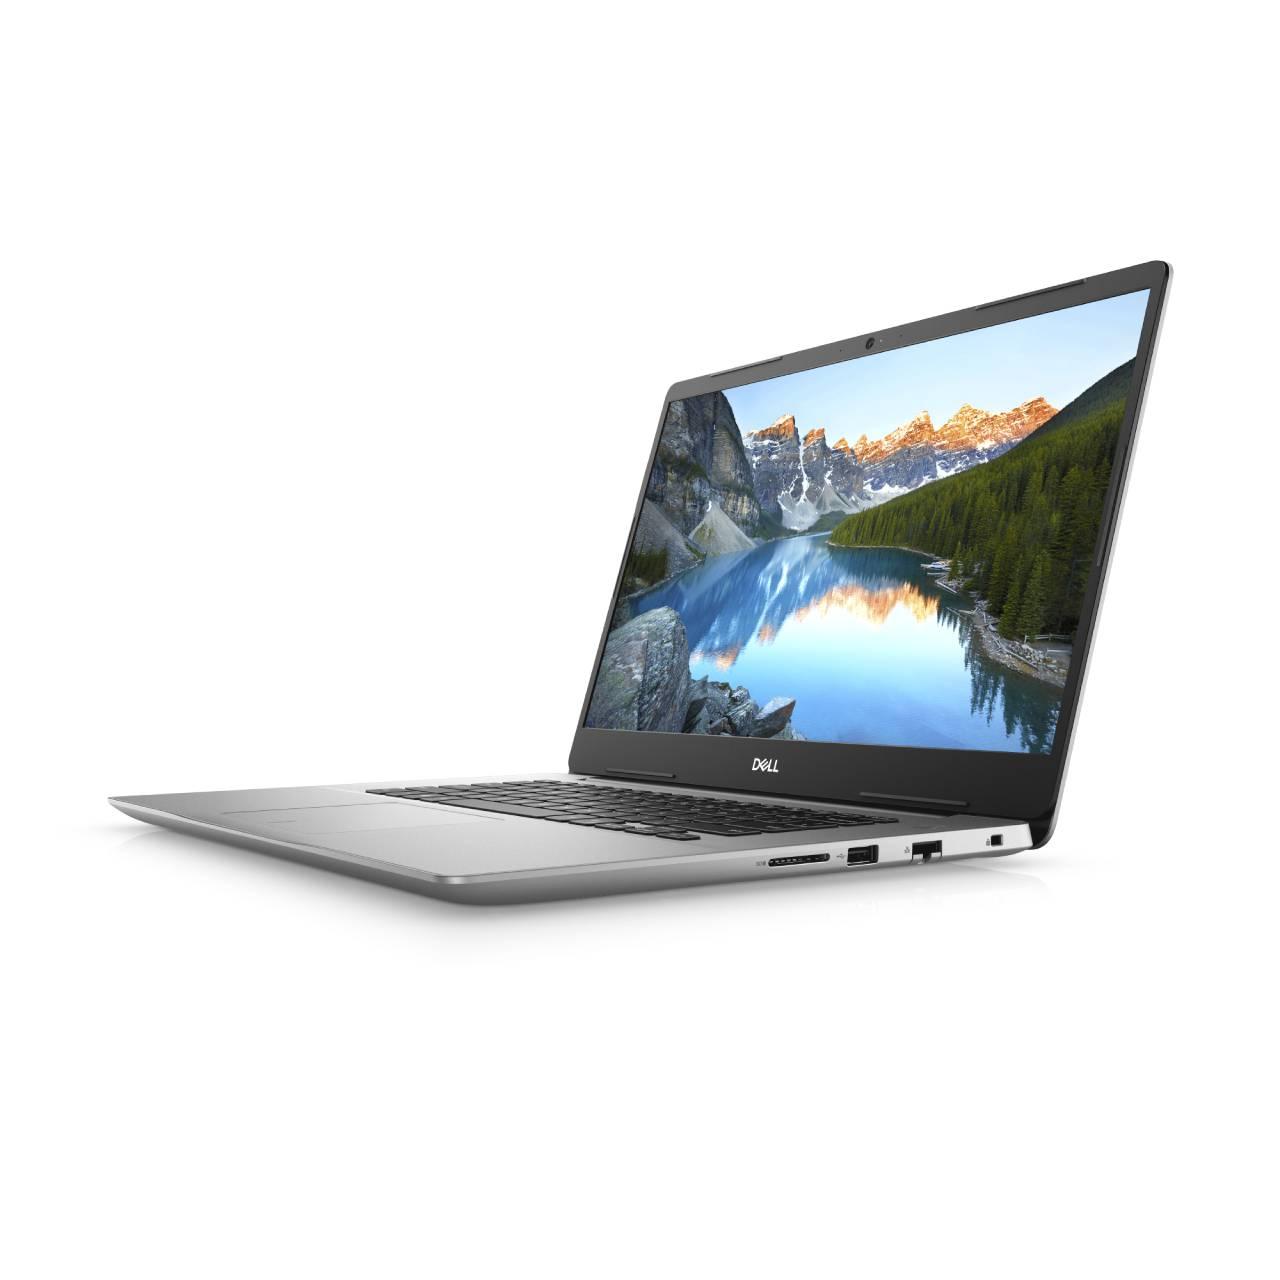 "Dell Inspiron 15 5585 Laptop 15.6"" AMD Ryzen 3 3200U AMD Radeon Vega 3 128GB SSD 4GB RAM : $349.99 AC + FS"